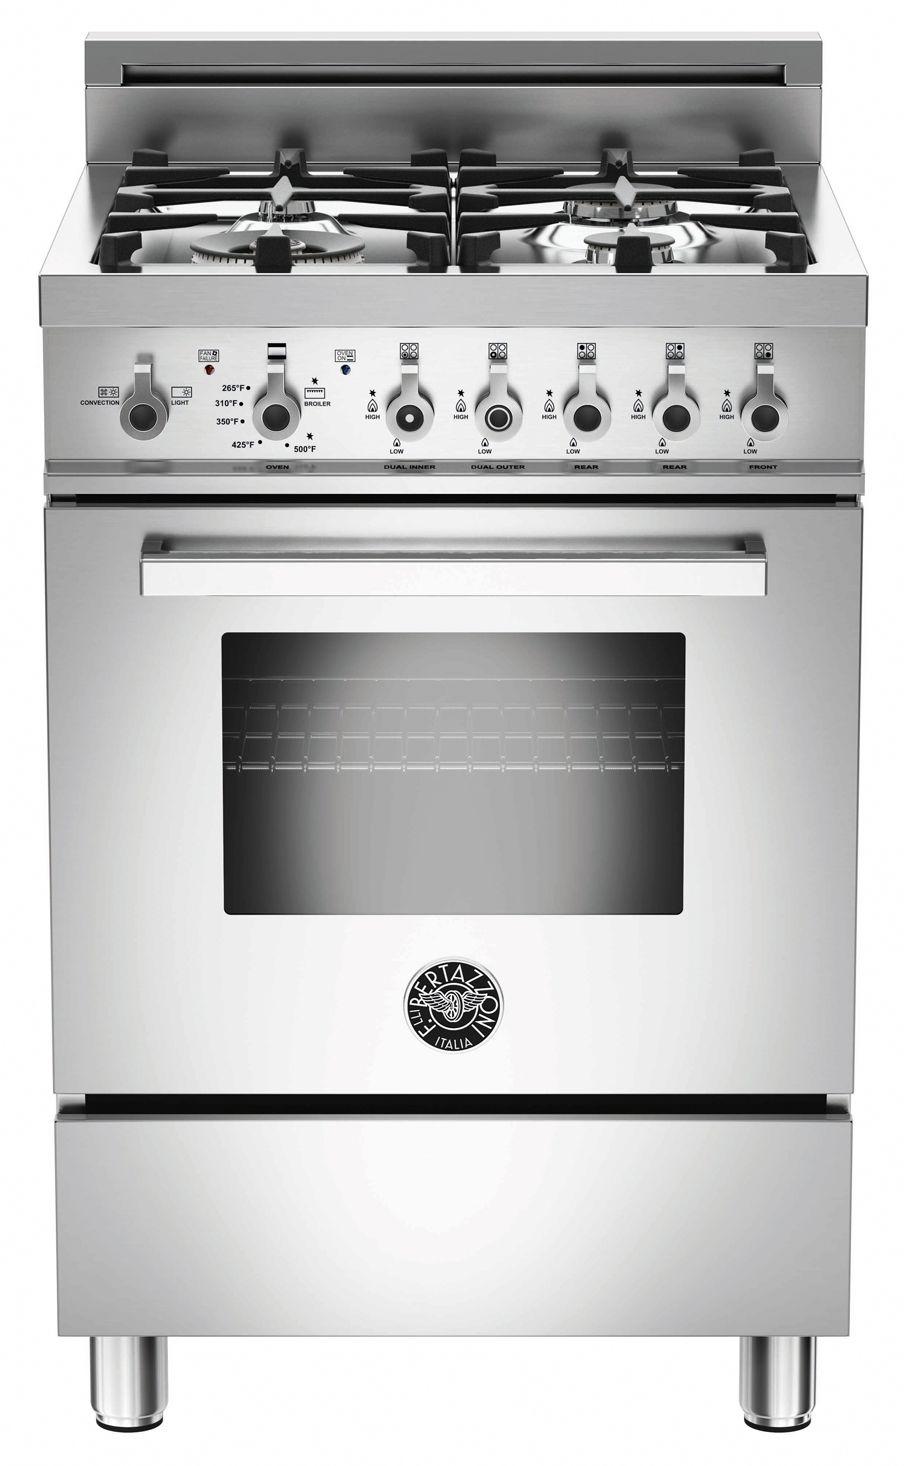 Pro Style Gas Range Home Appliances, Kitchen Appliances in San ...